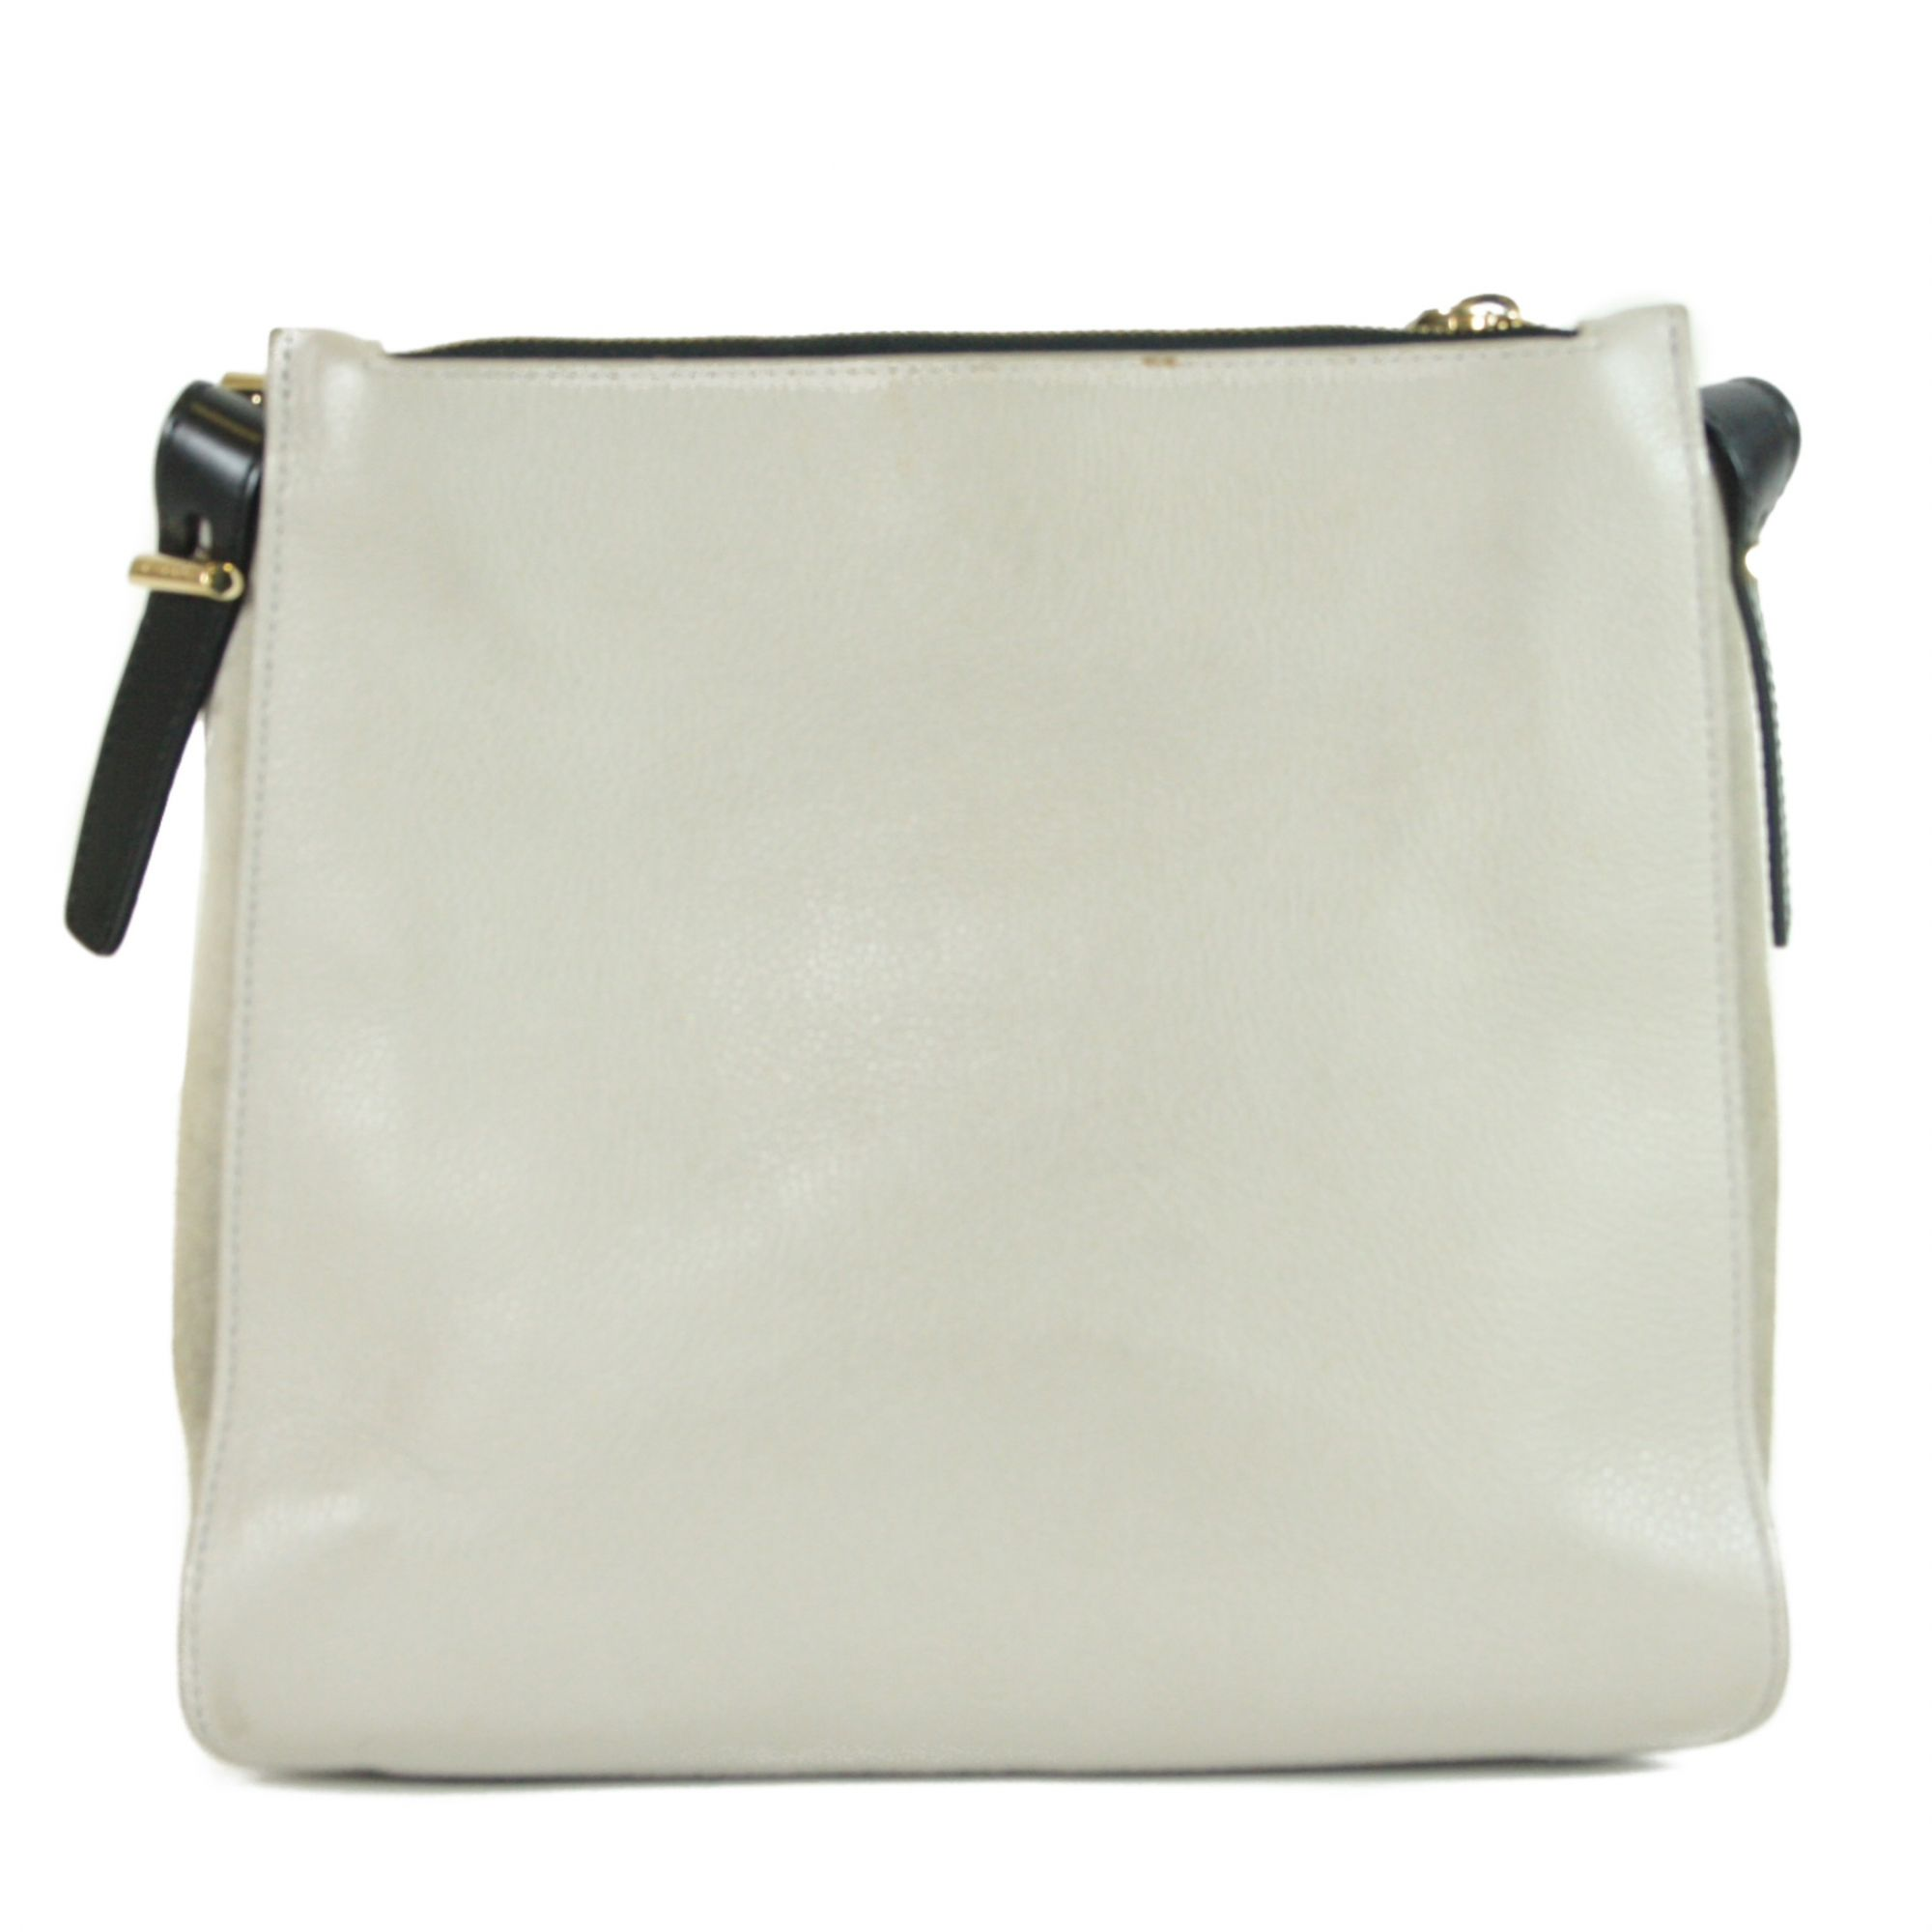 Leather Buckle Flap Crossbody Bag